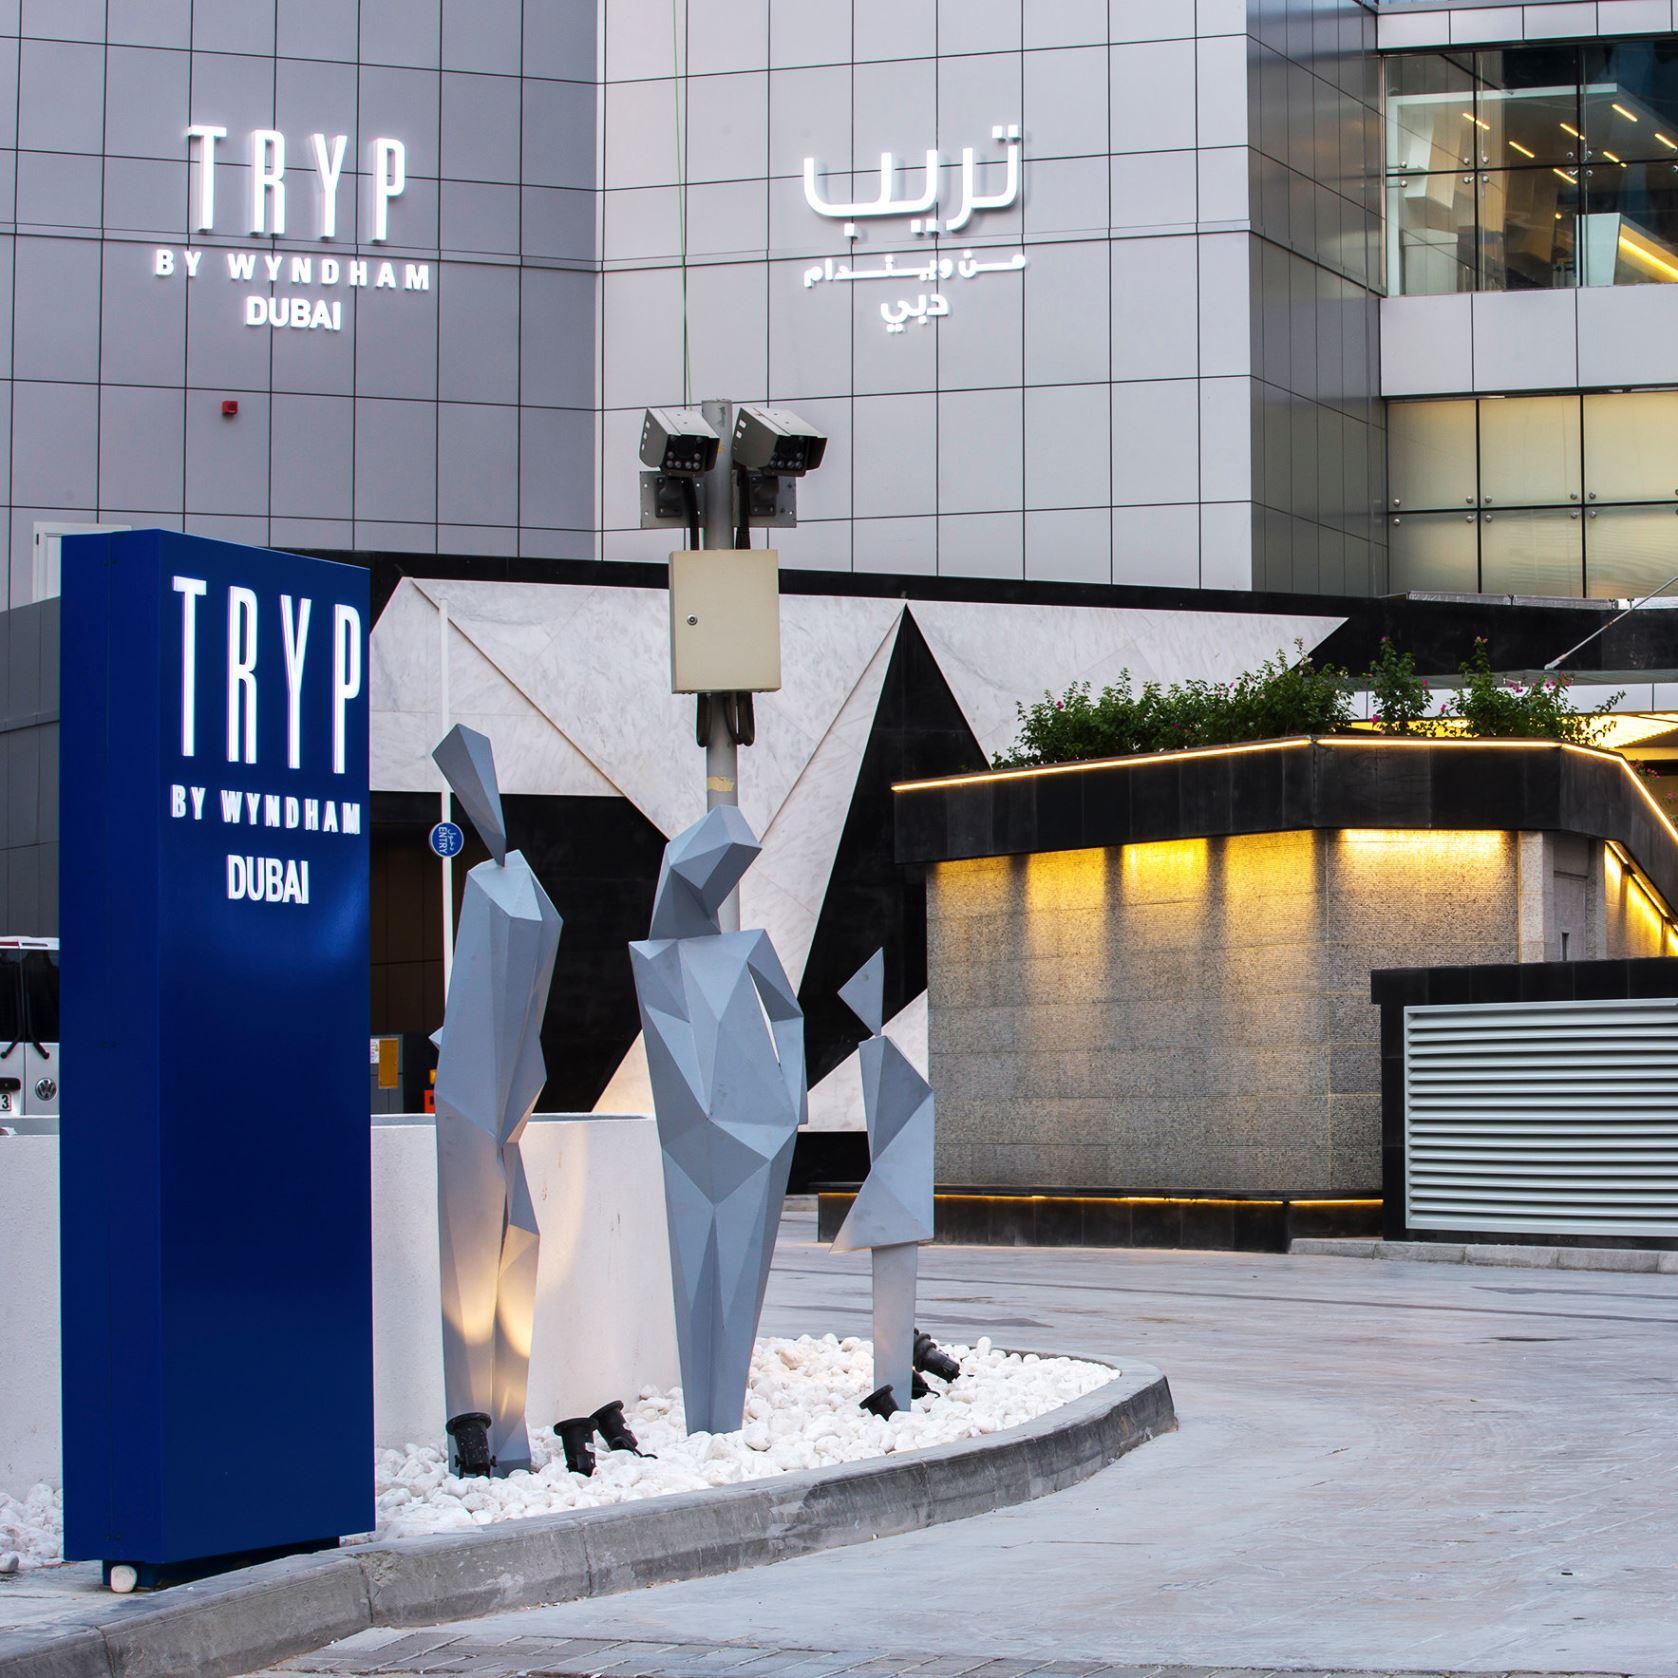 The First Group تحتفل بإنجاز هام في حافظة الفنادق مع استكمال فندق تريب باي ويندهام دبي